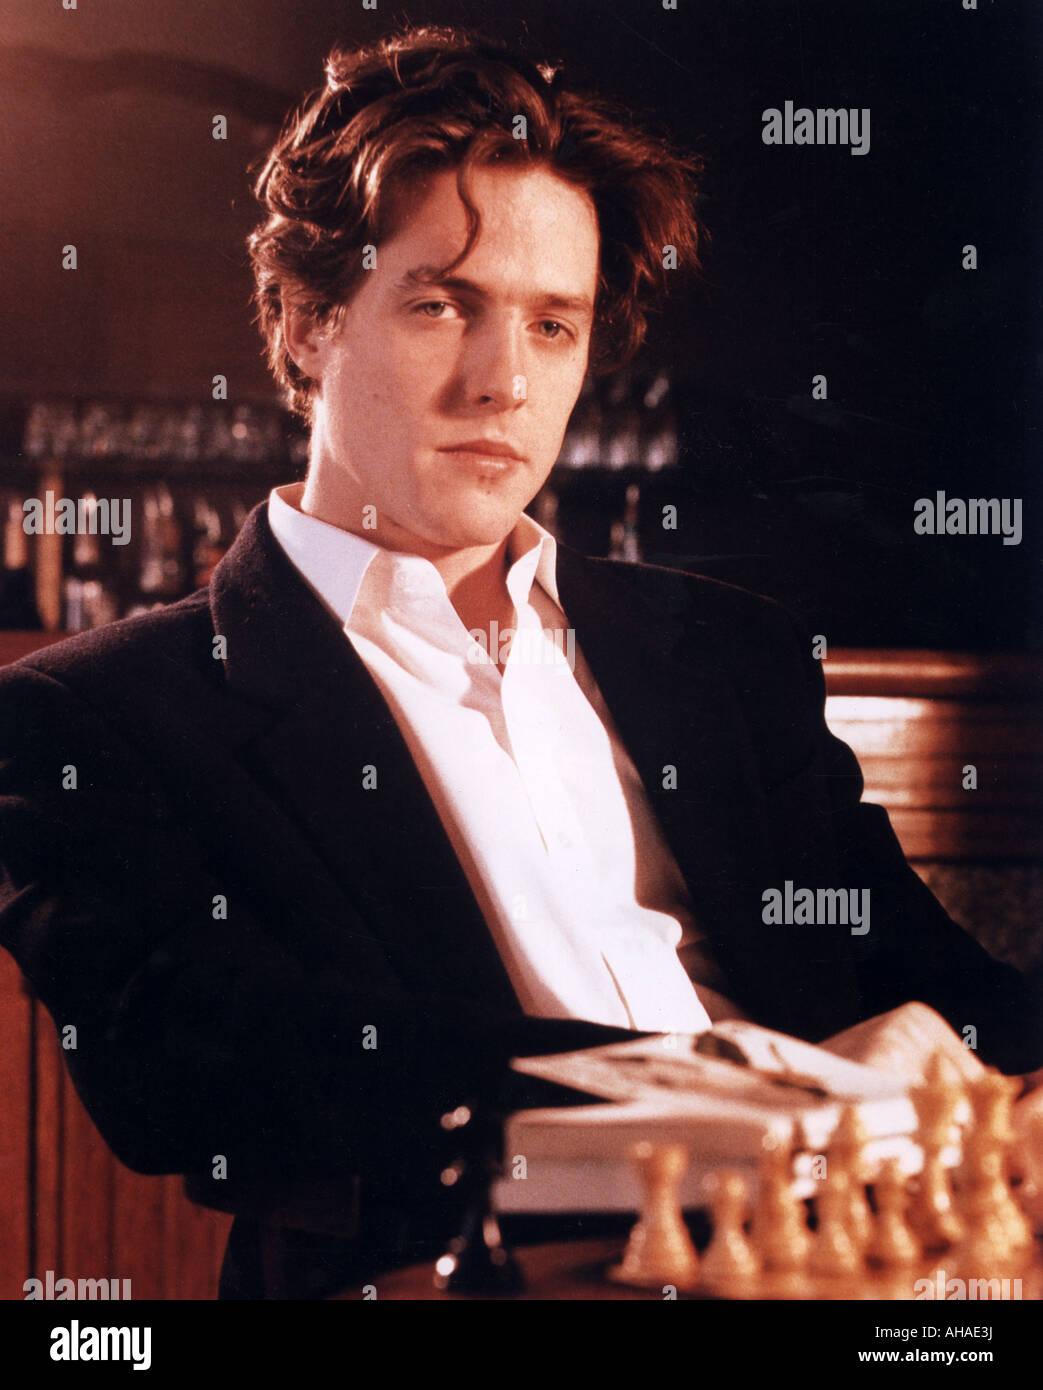 MAURICE 1987 Cinecom film with Hugh Grant - Stock Image